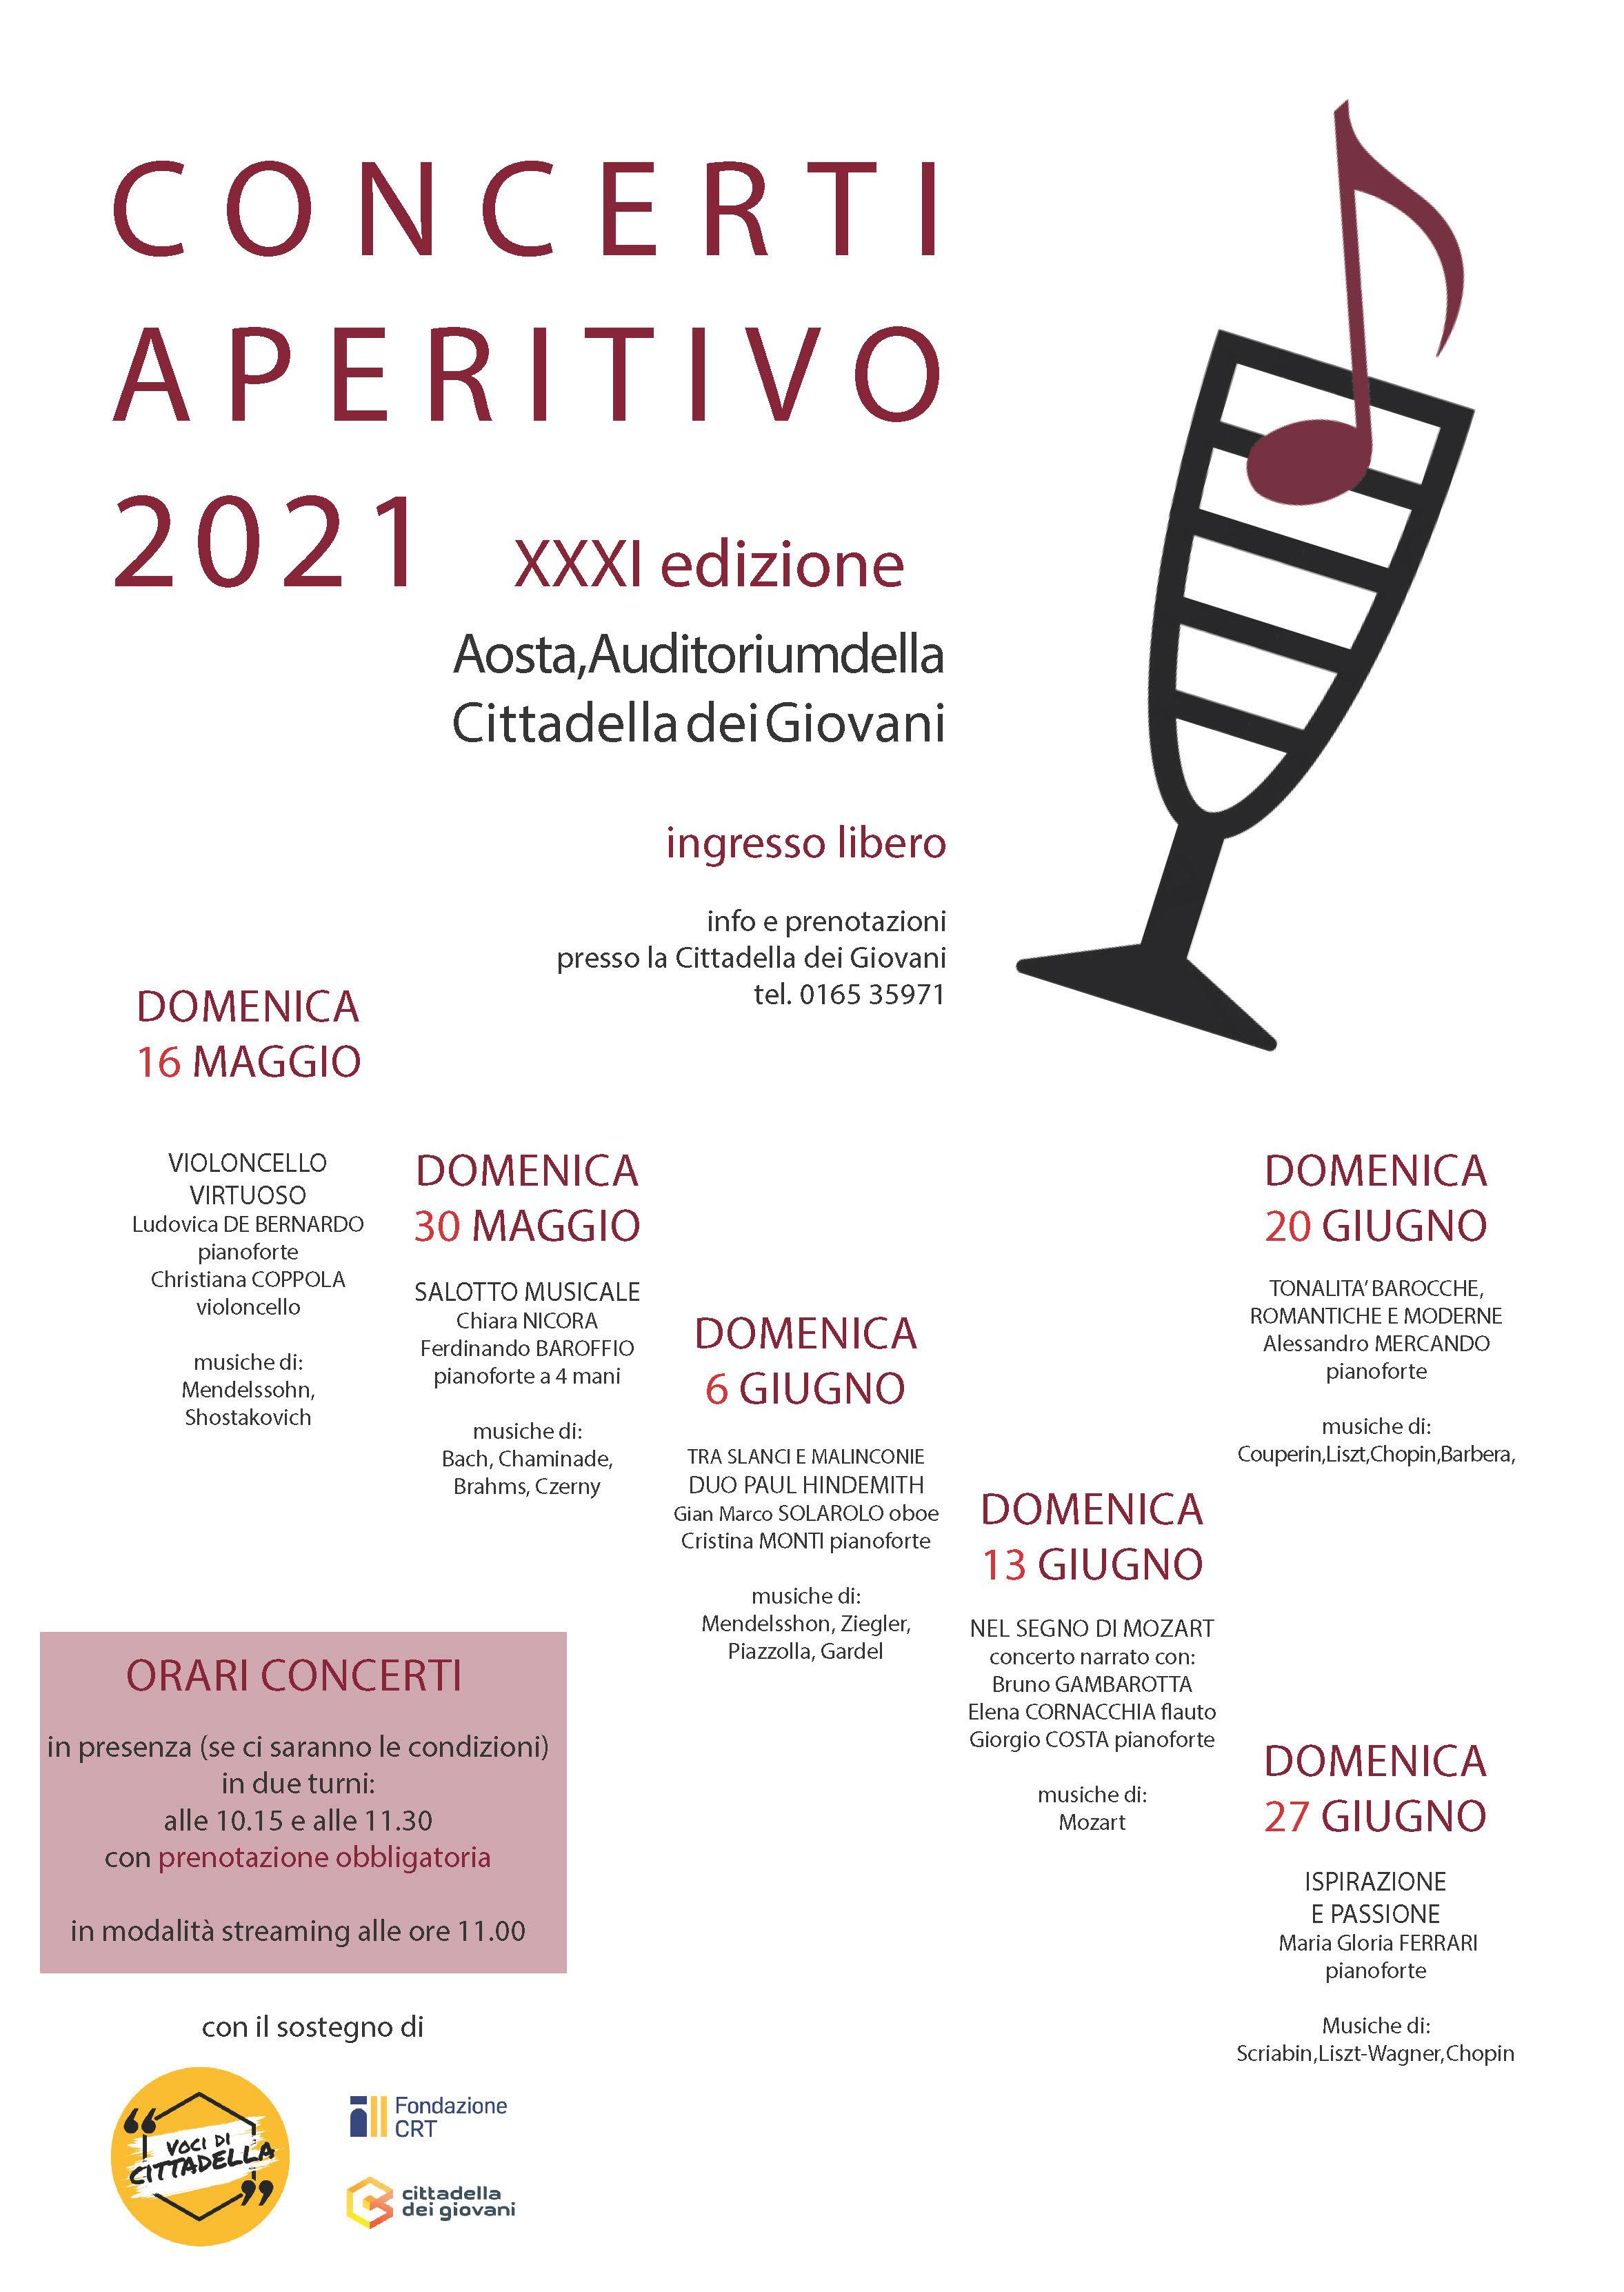 Aperitivo Aosta concerto 2021